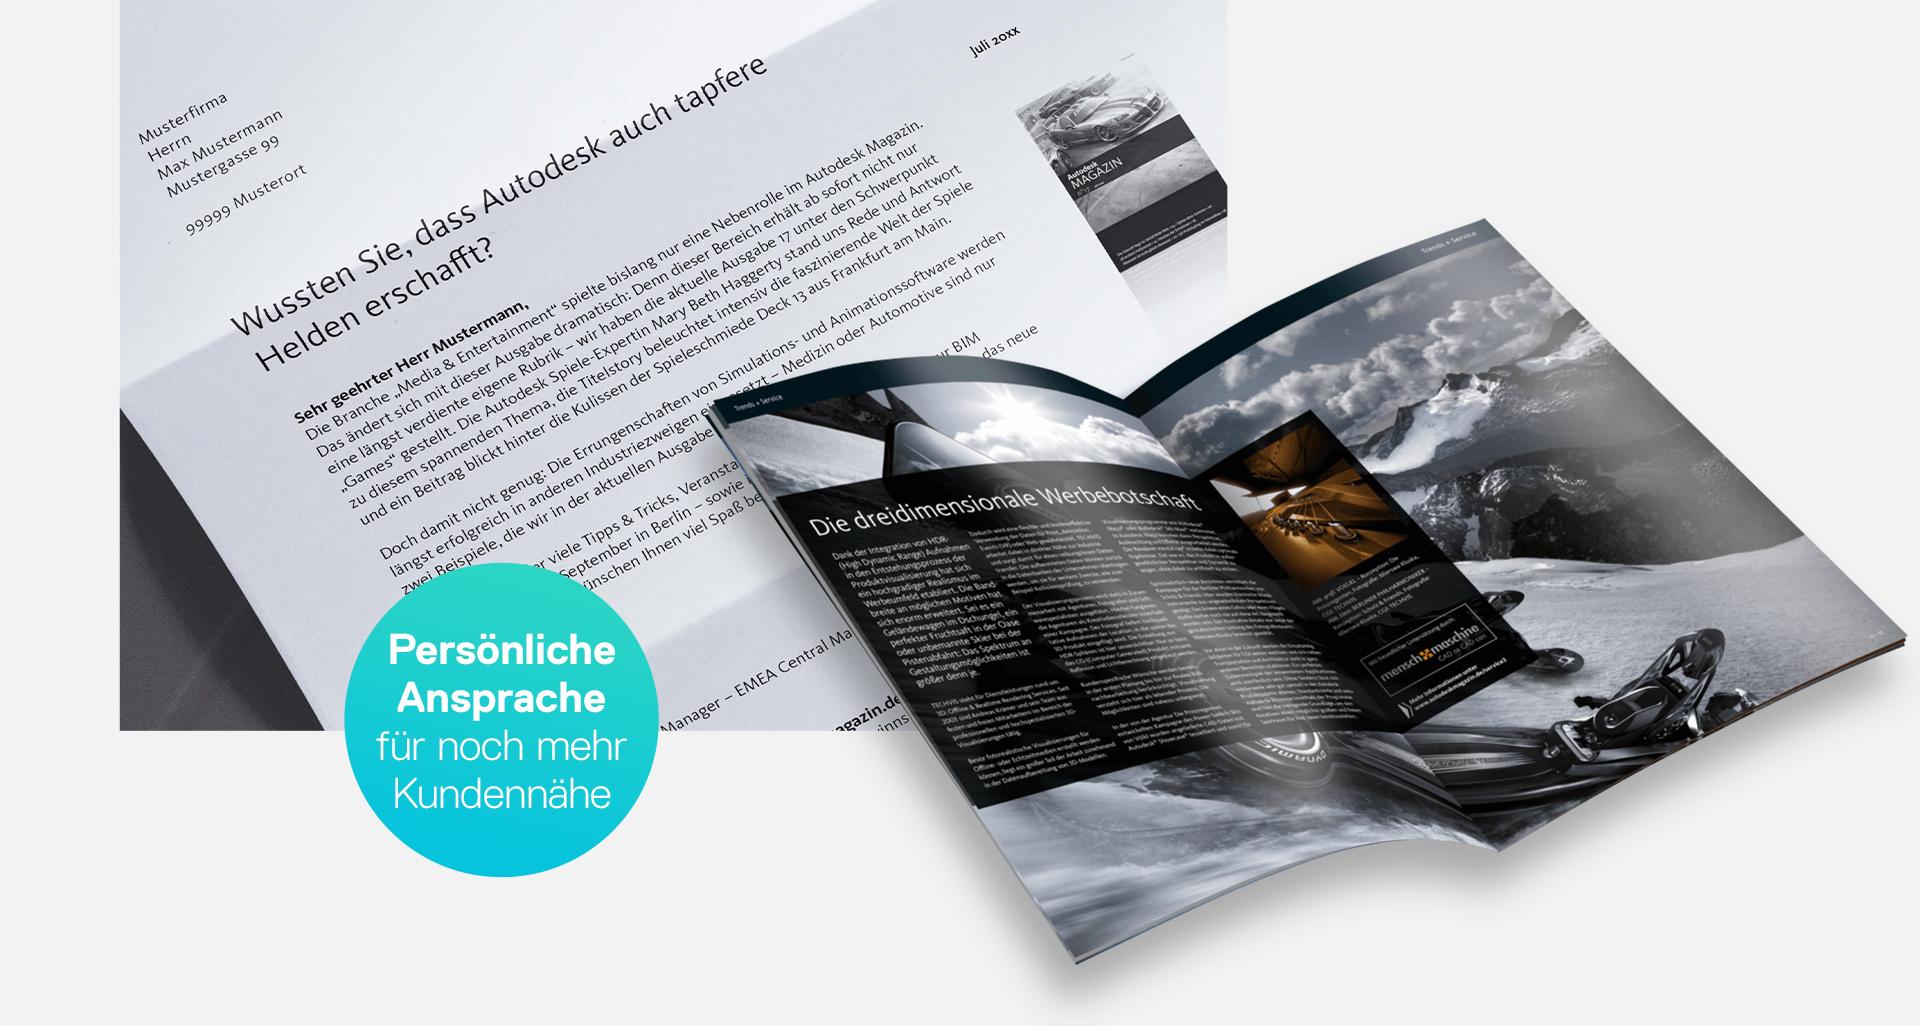 web_Autodesk_BILD-D